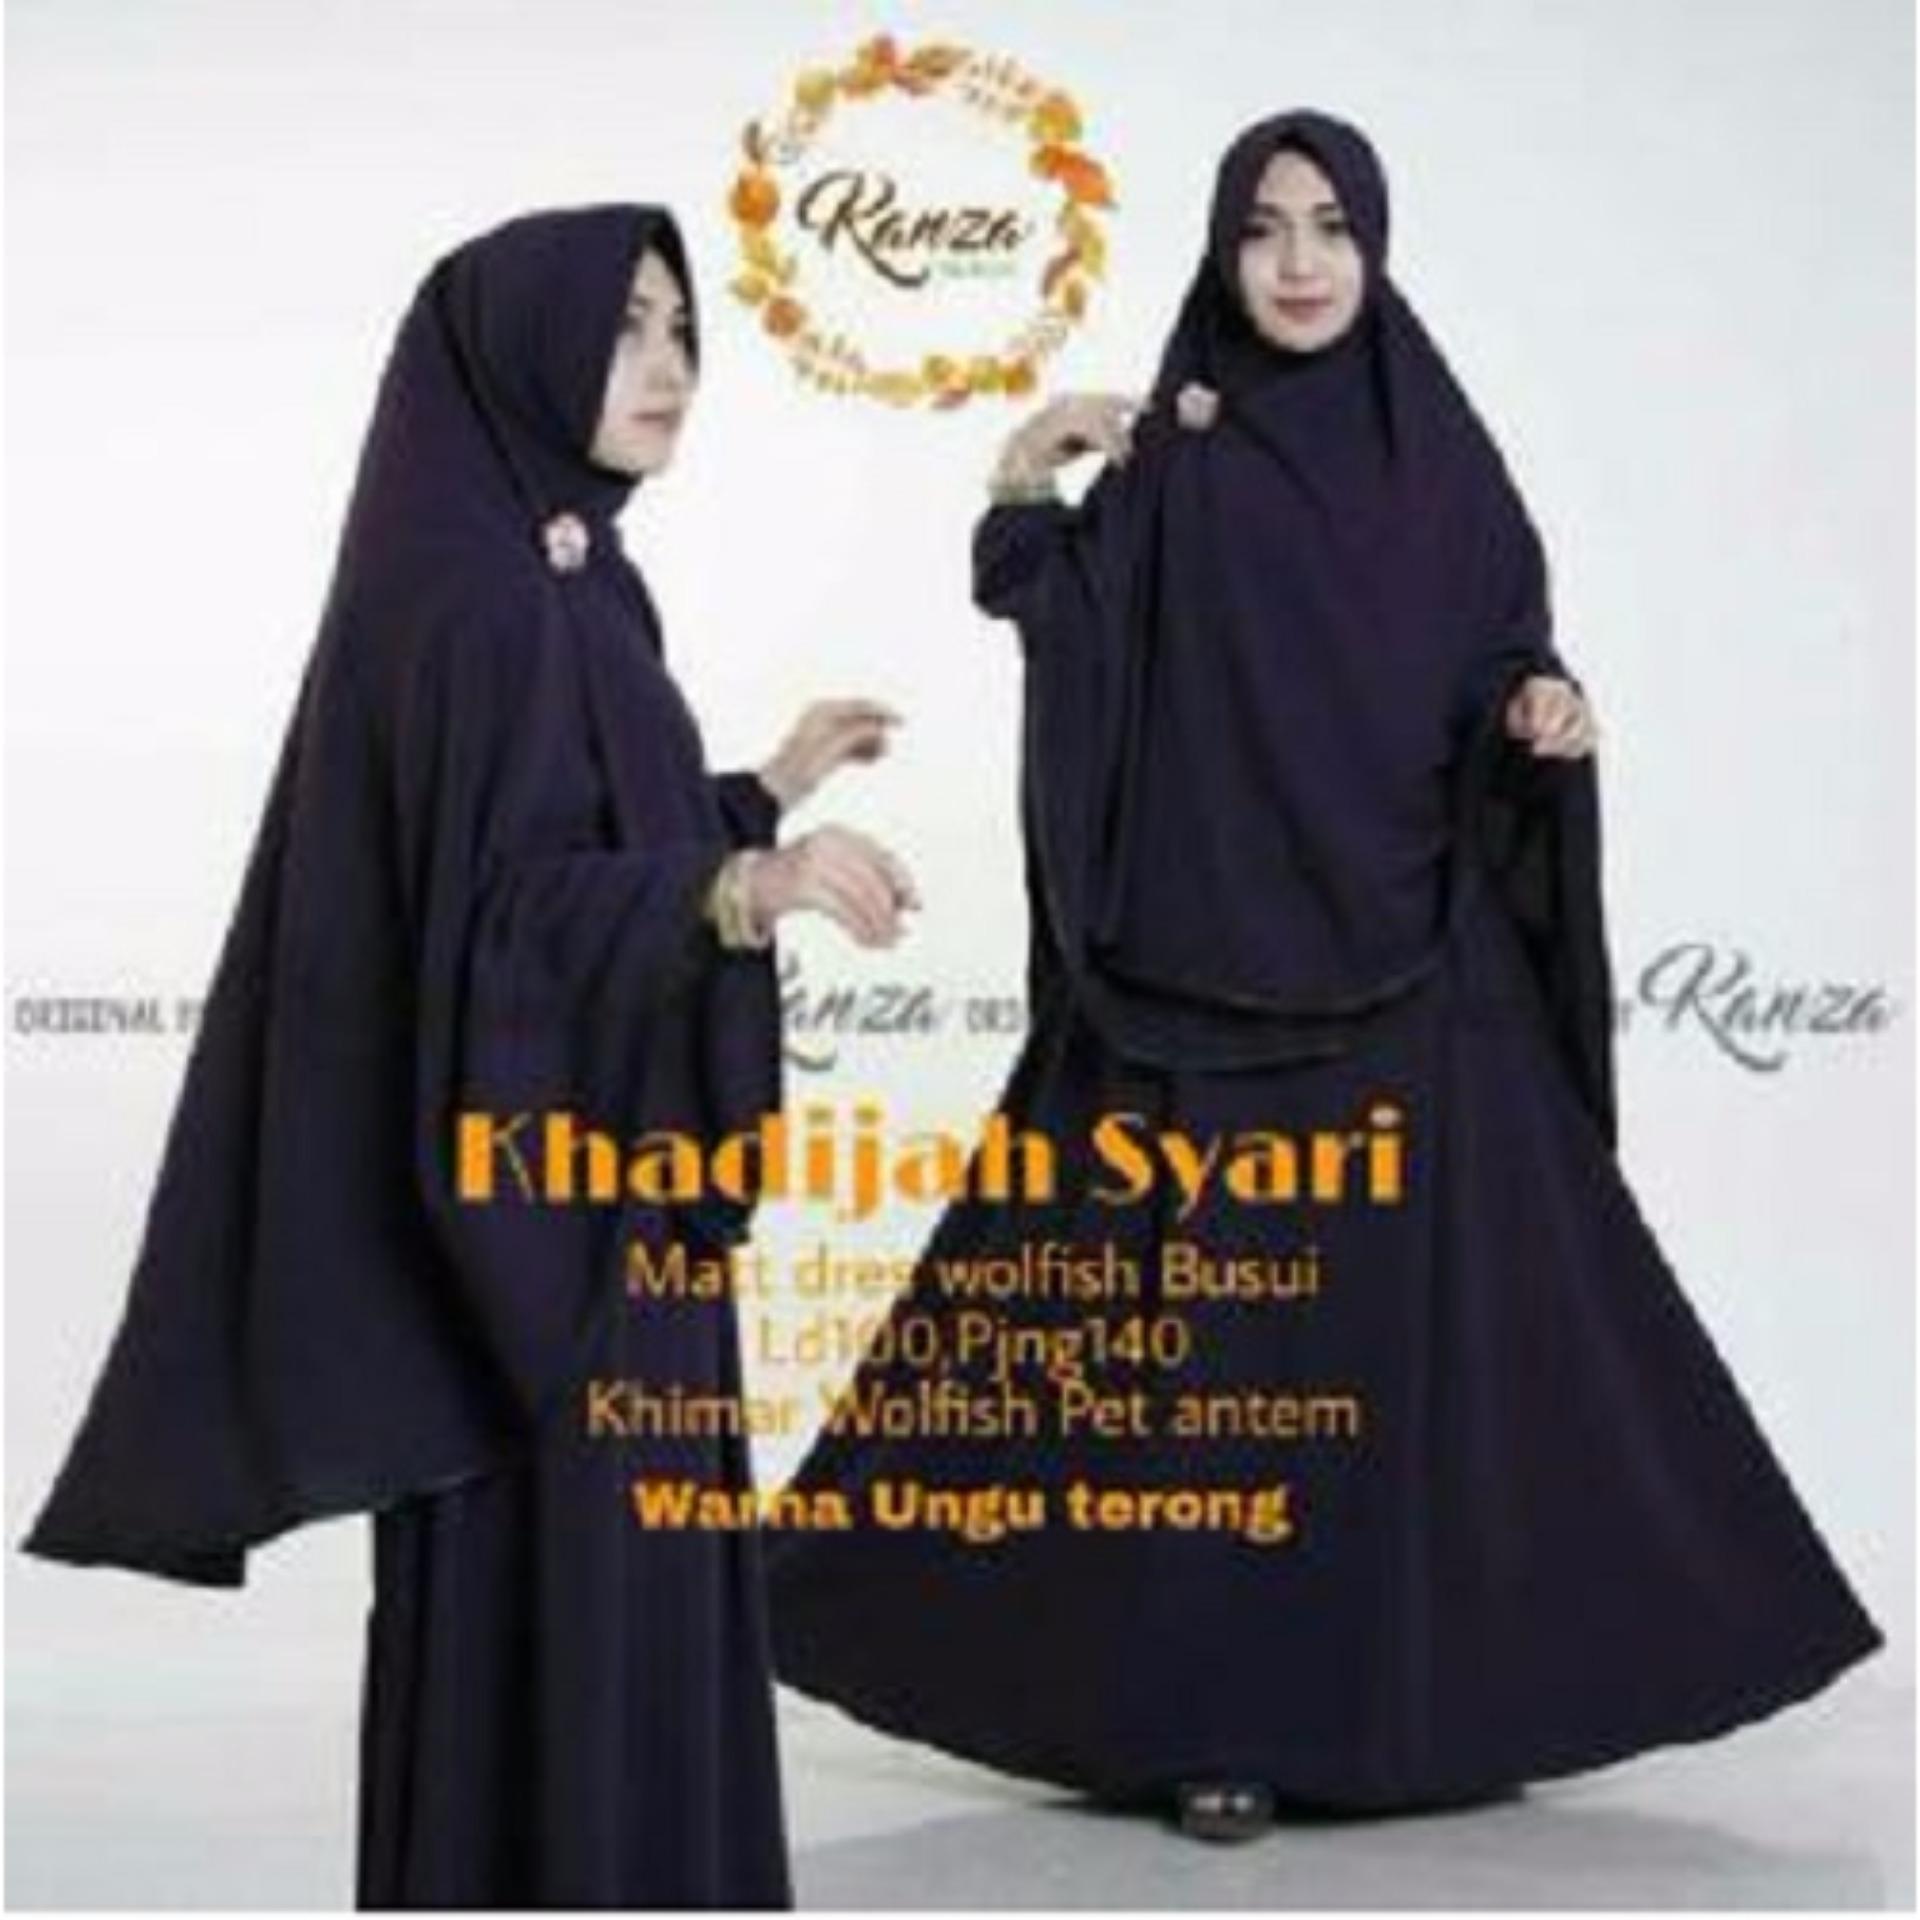 Model Elegan Baju Original Dress Khadijah Syar i Gamis Baju Panjang Casual Wanita Hijab Baju Pesta Modern